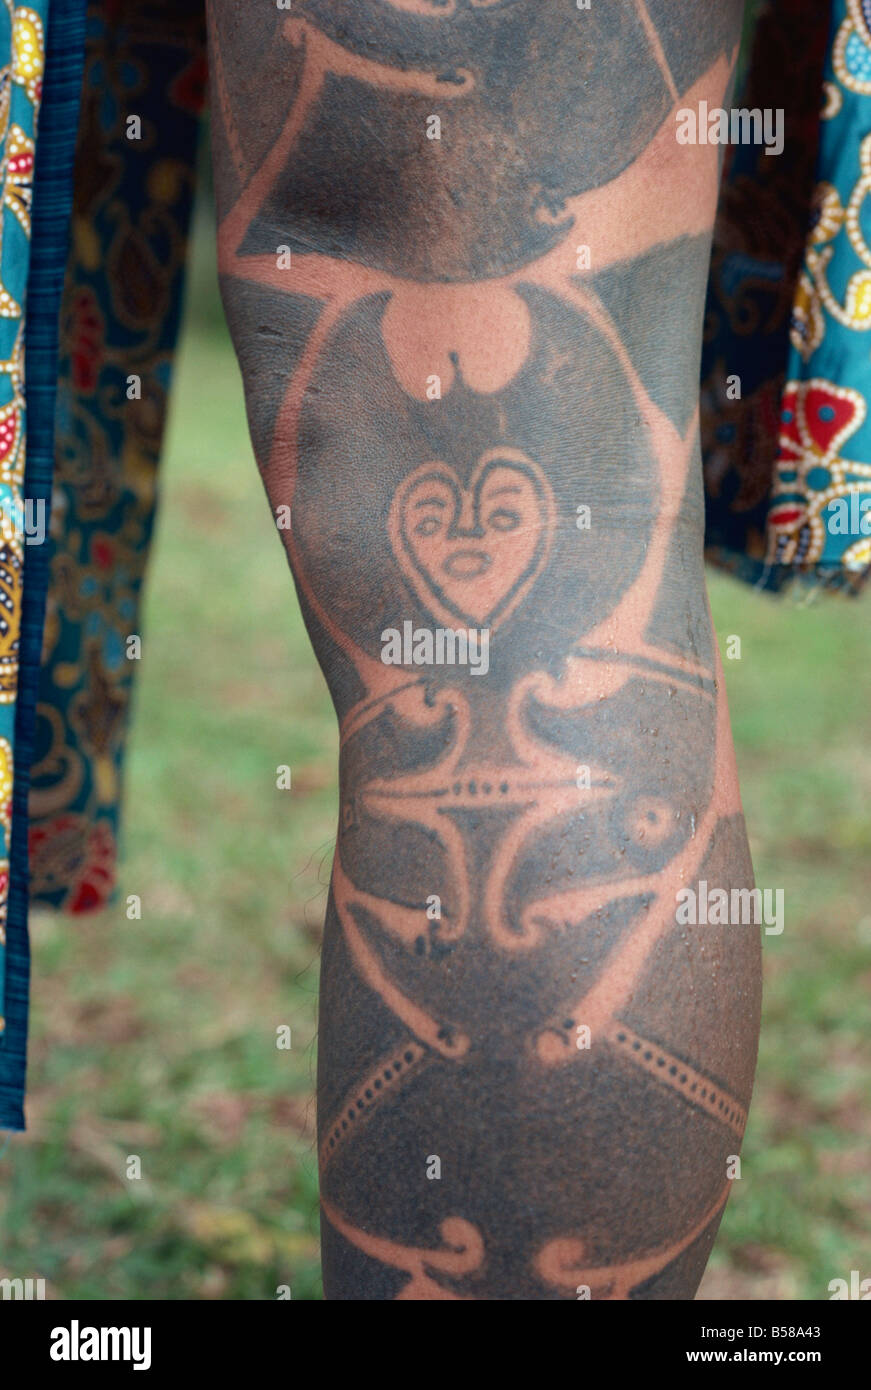 Tattoo, now rare, Iban tribe, Brunei, Borneo, Southeast Asia - Stock Image